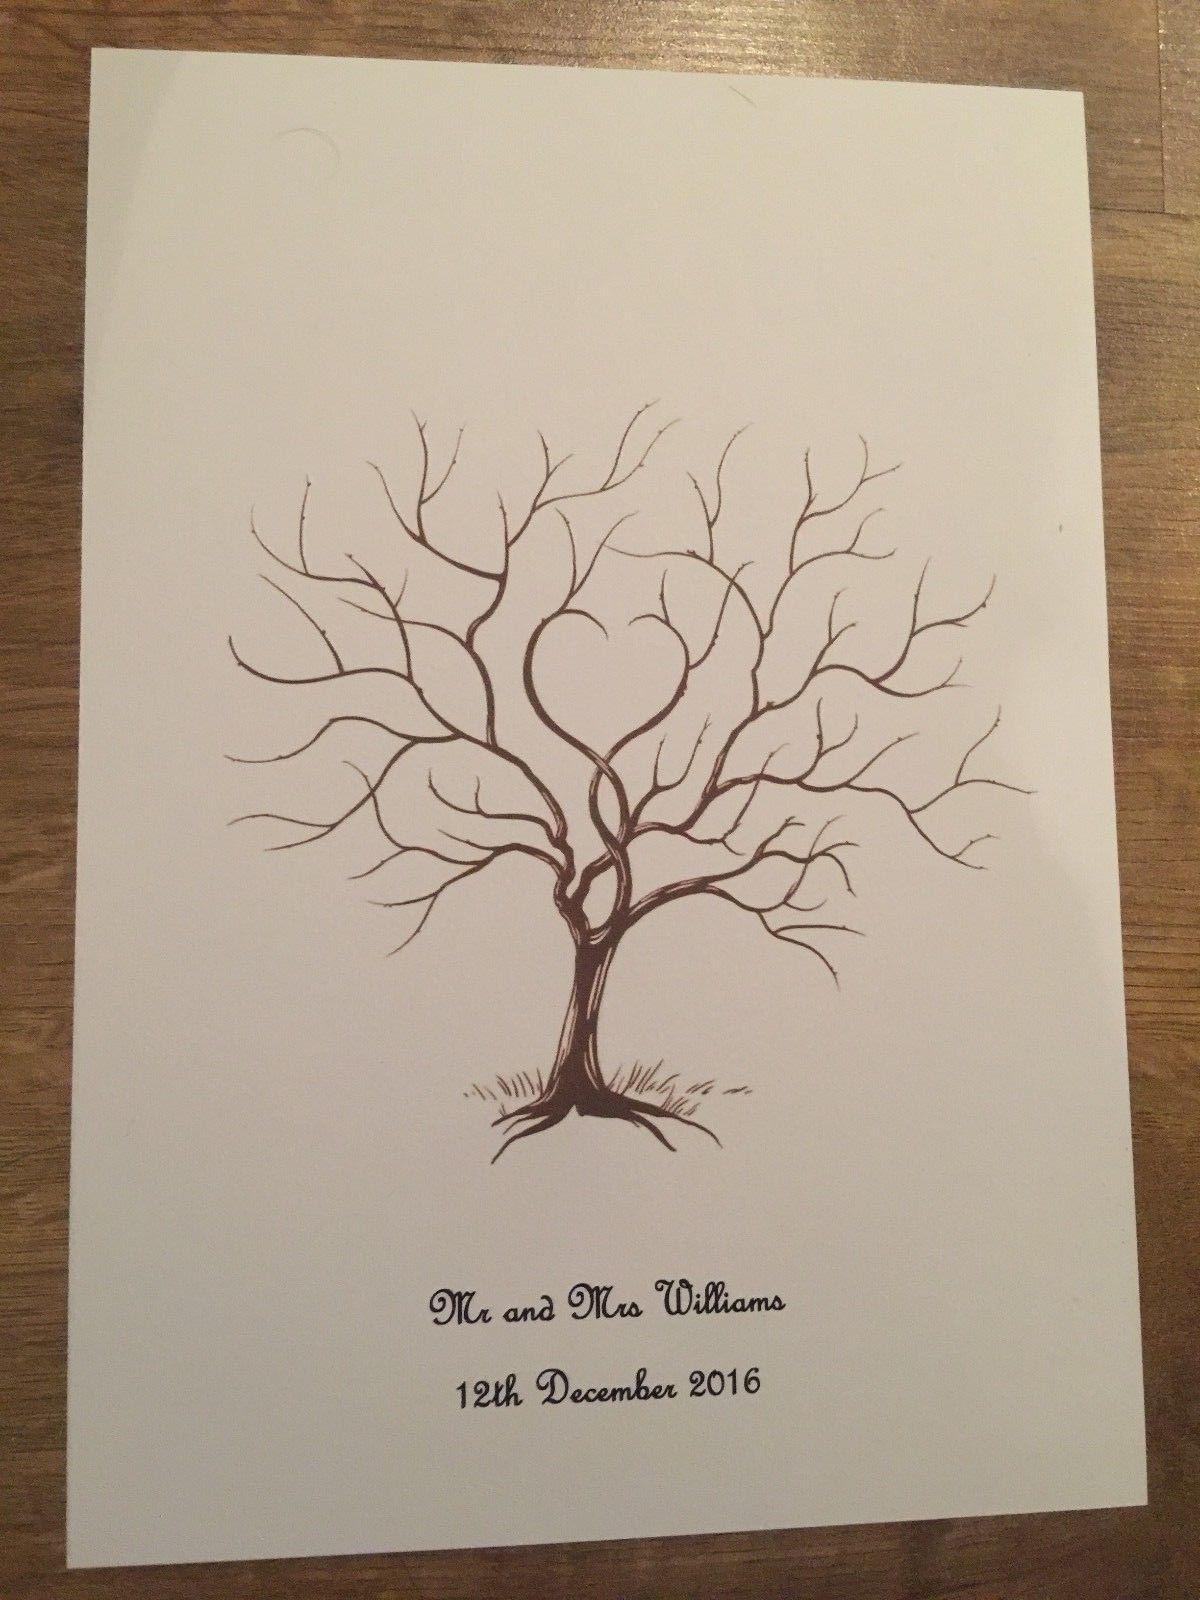 Fingerprint tree for wedding or christening - keepsake - guest book - ink pad | eBay